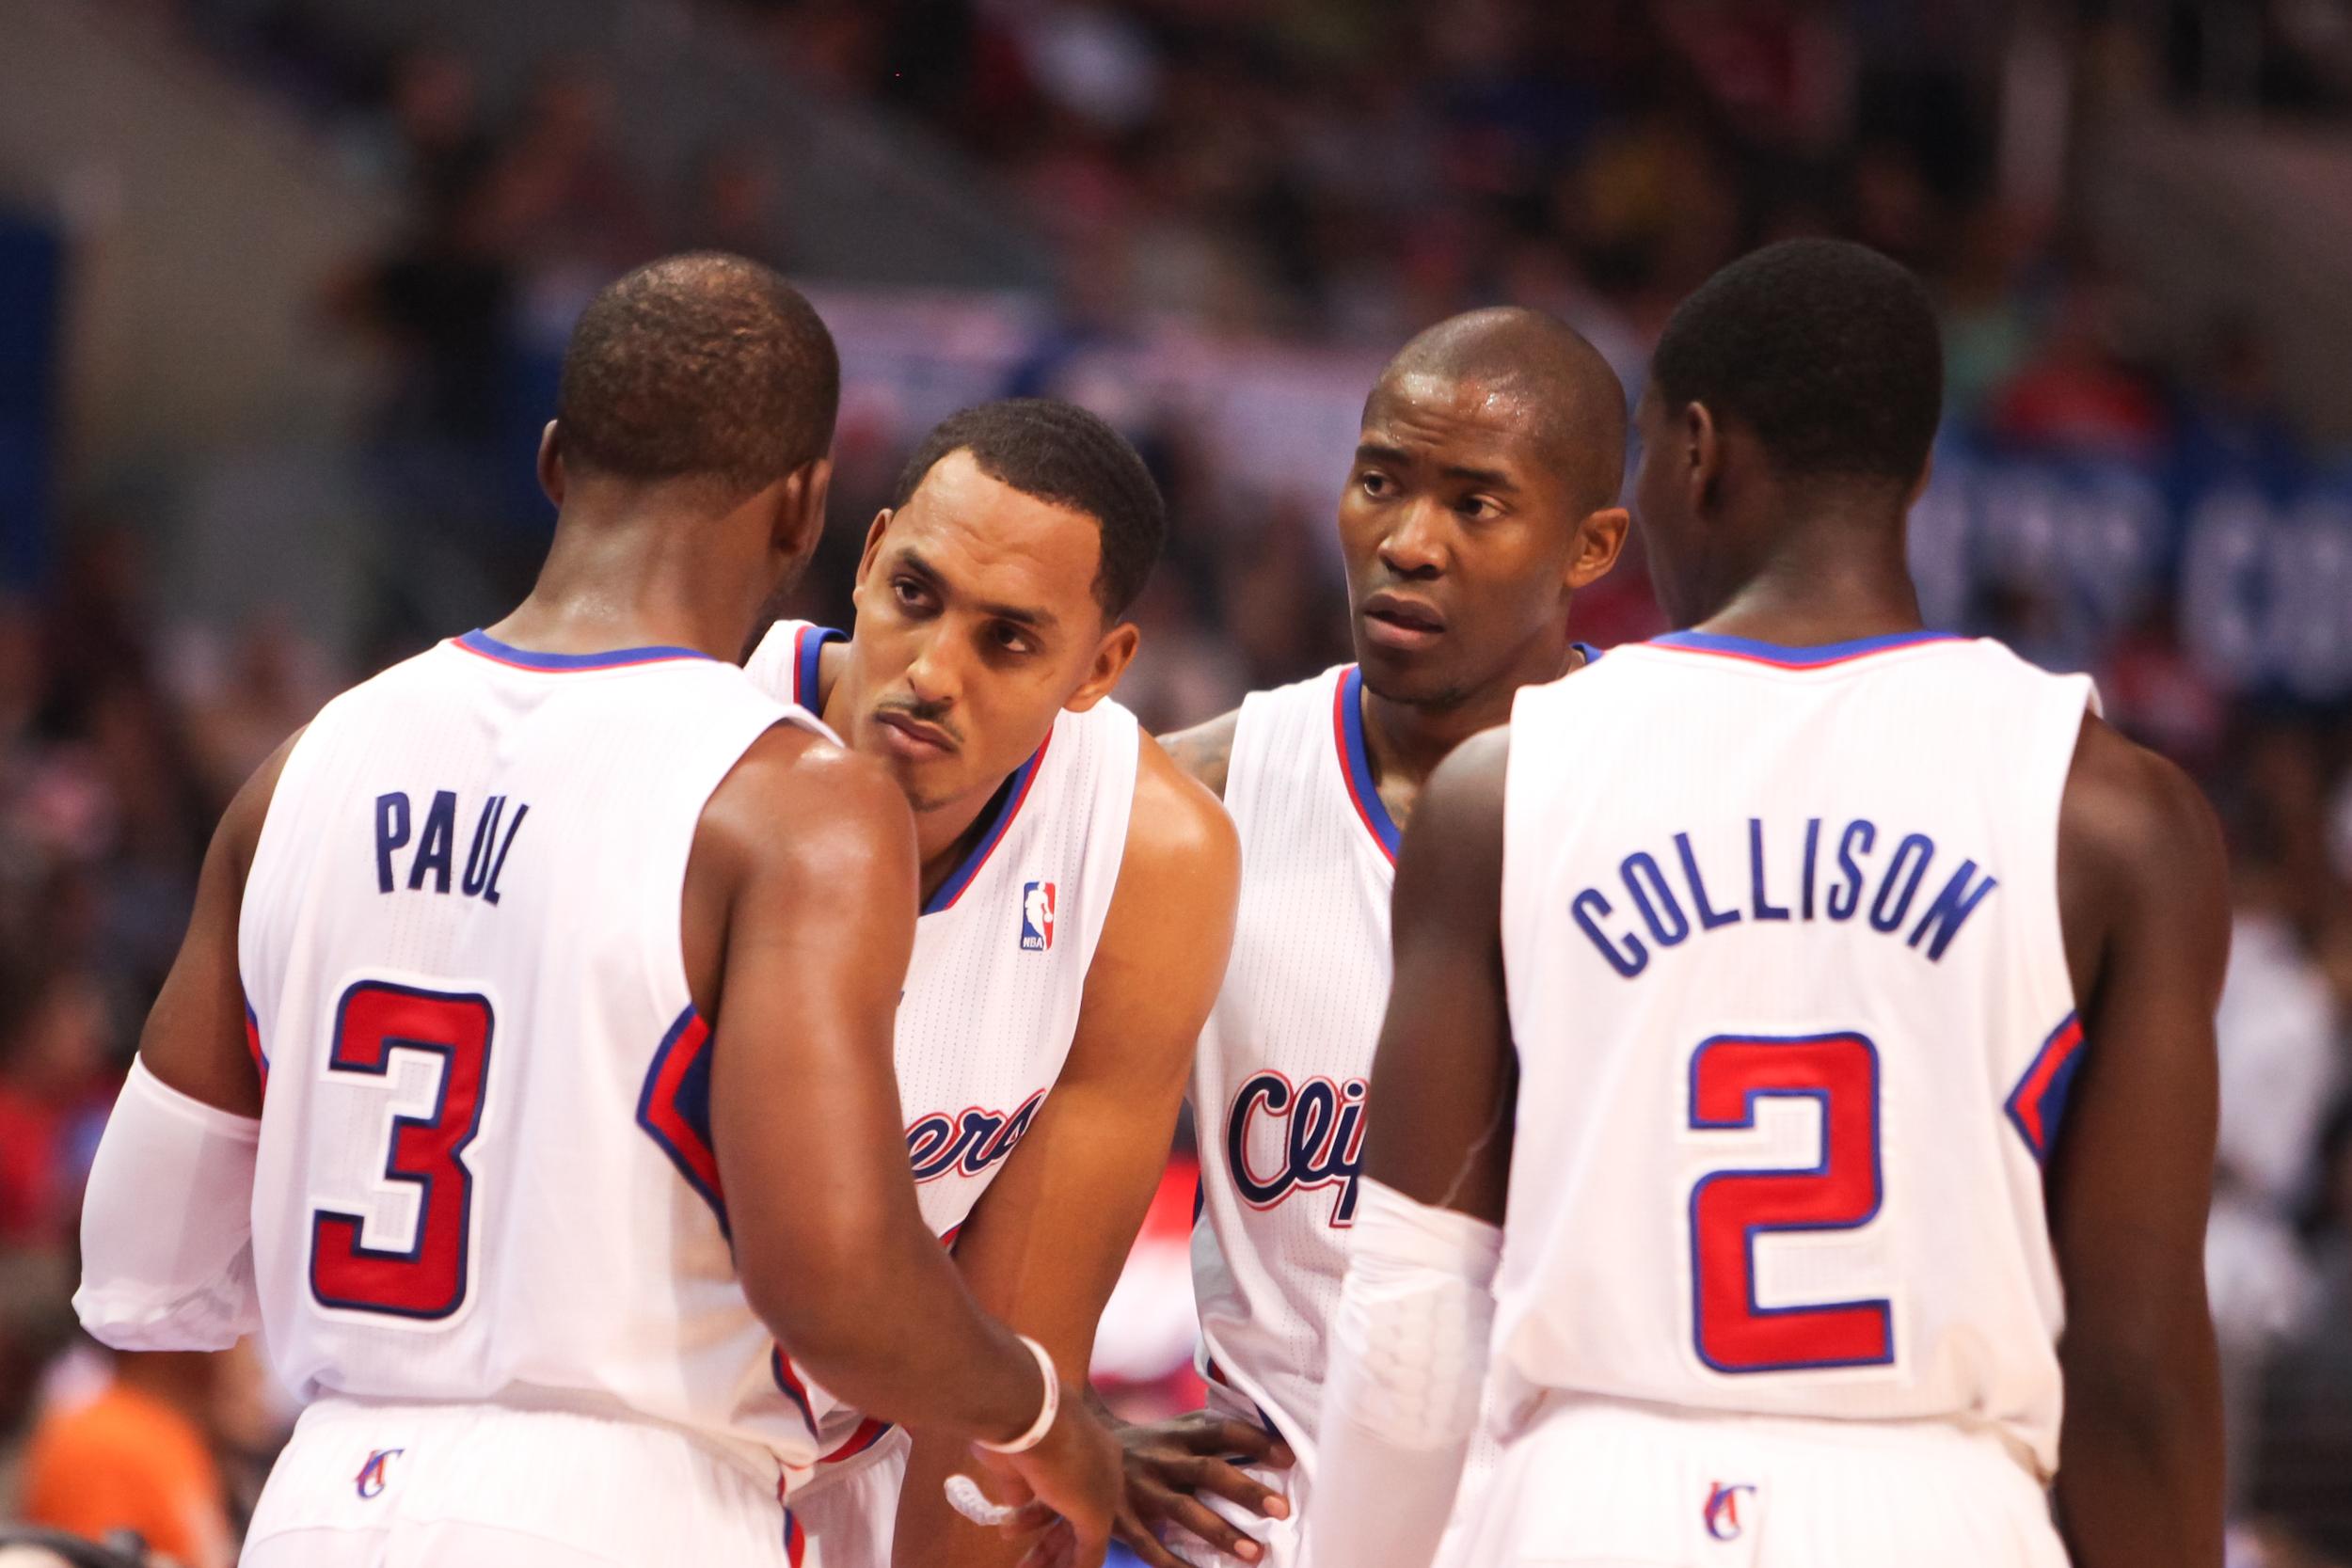 Clippers vs Thunder 11.13.30 / Photos by Varon Panganiban/Clippers